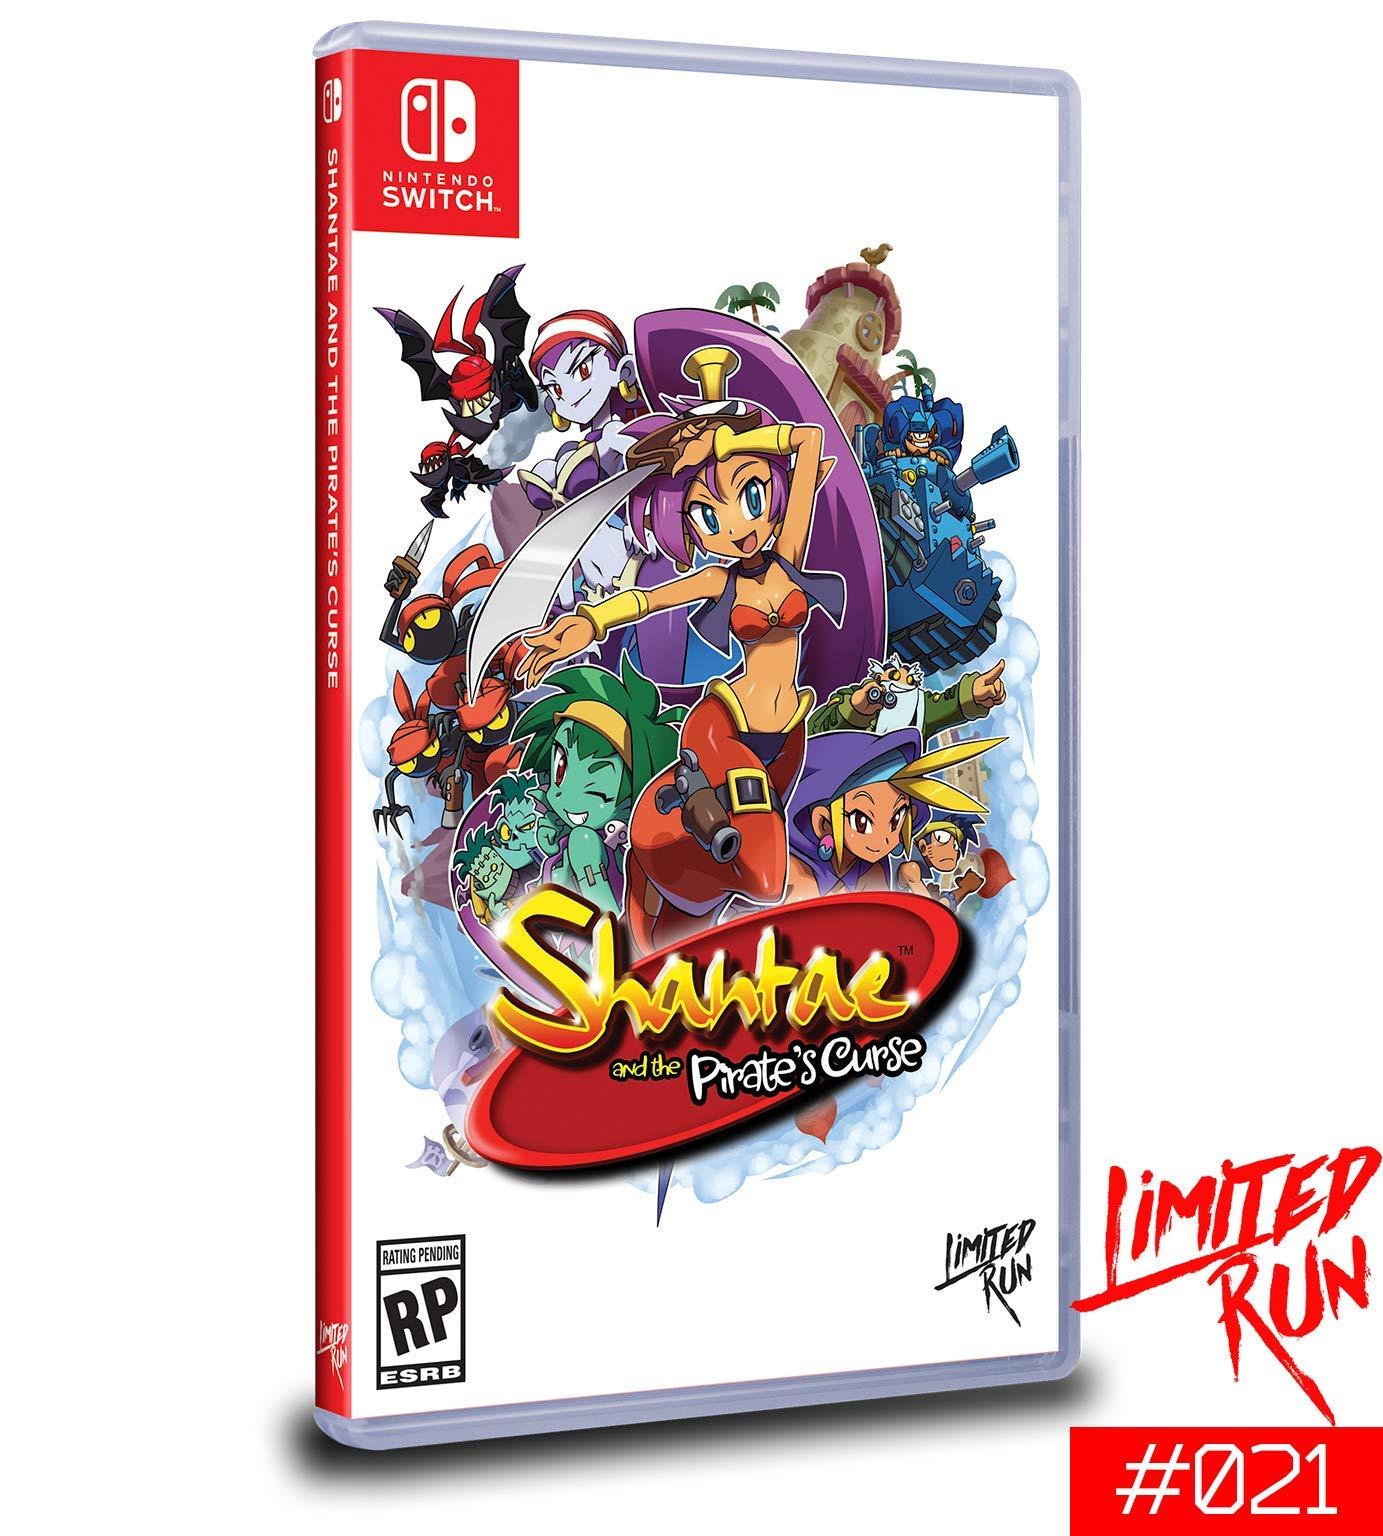 Amazon.com: Shantae and the Pirates Curse - Nintendo Switch ...